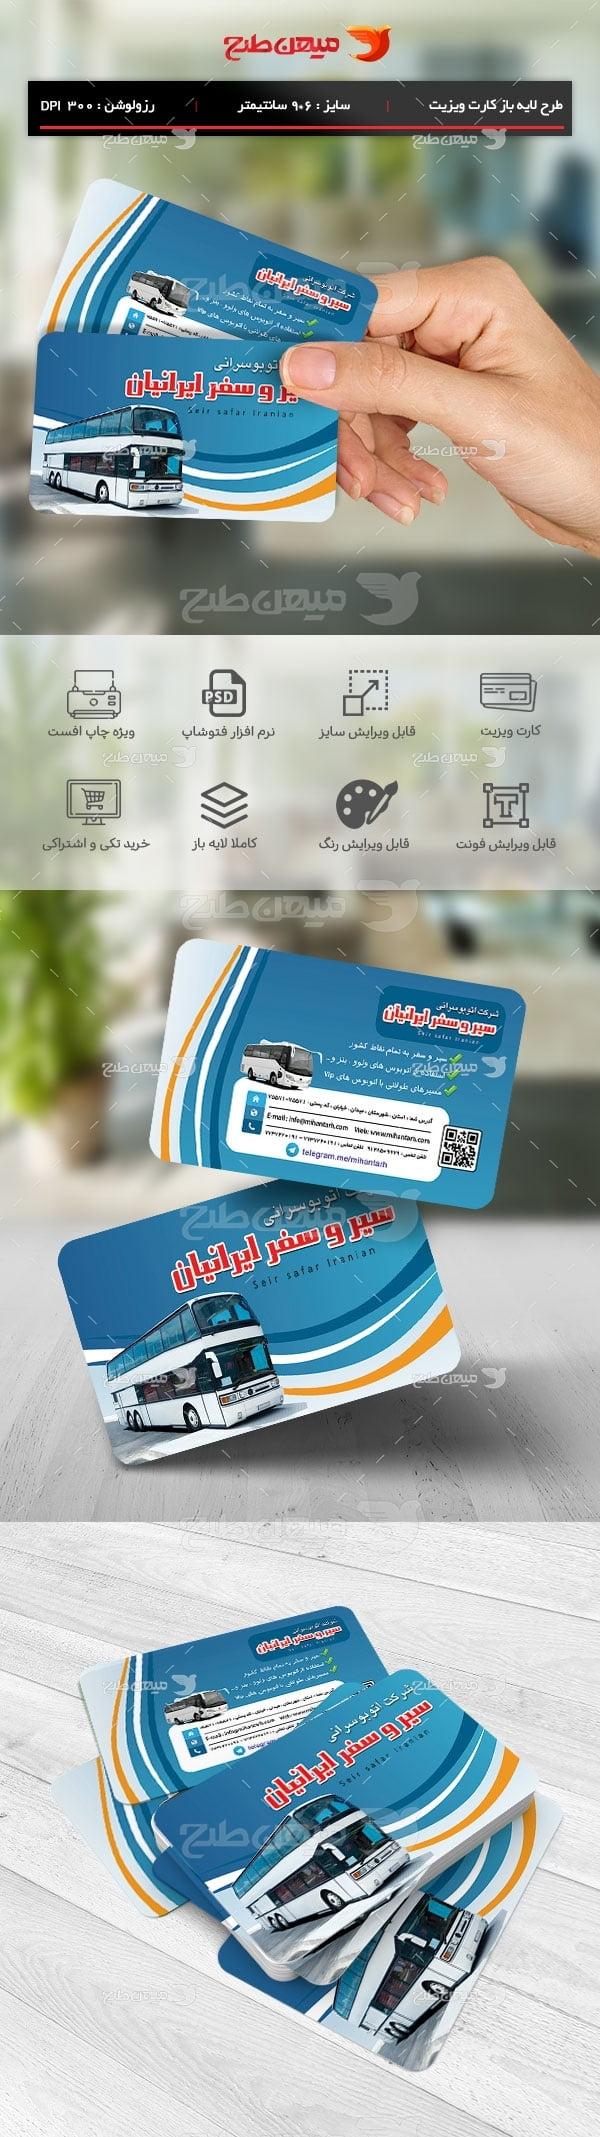 طرح کارت ویزیت شرکت اتوبوسرانی 10